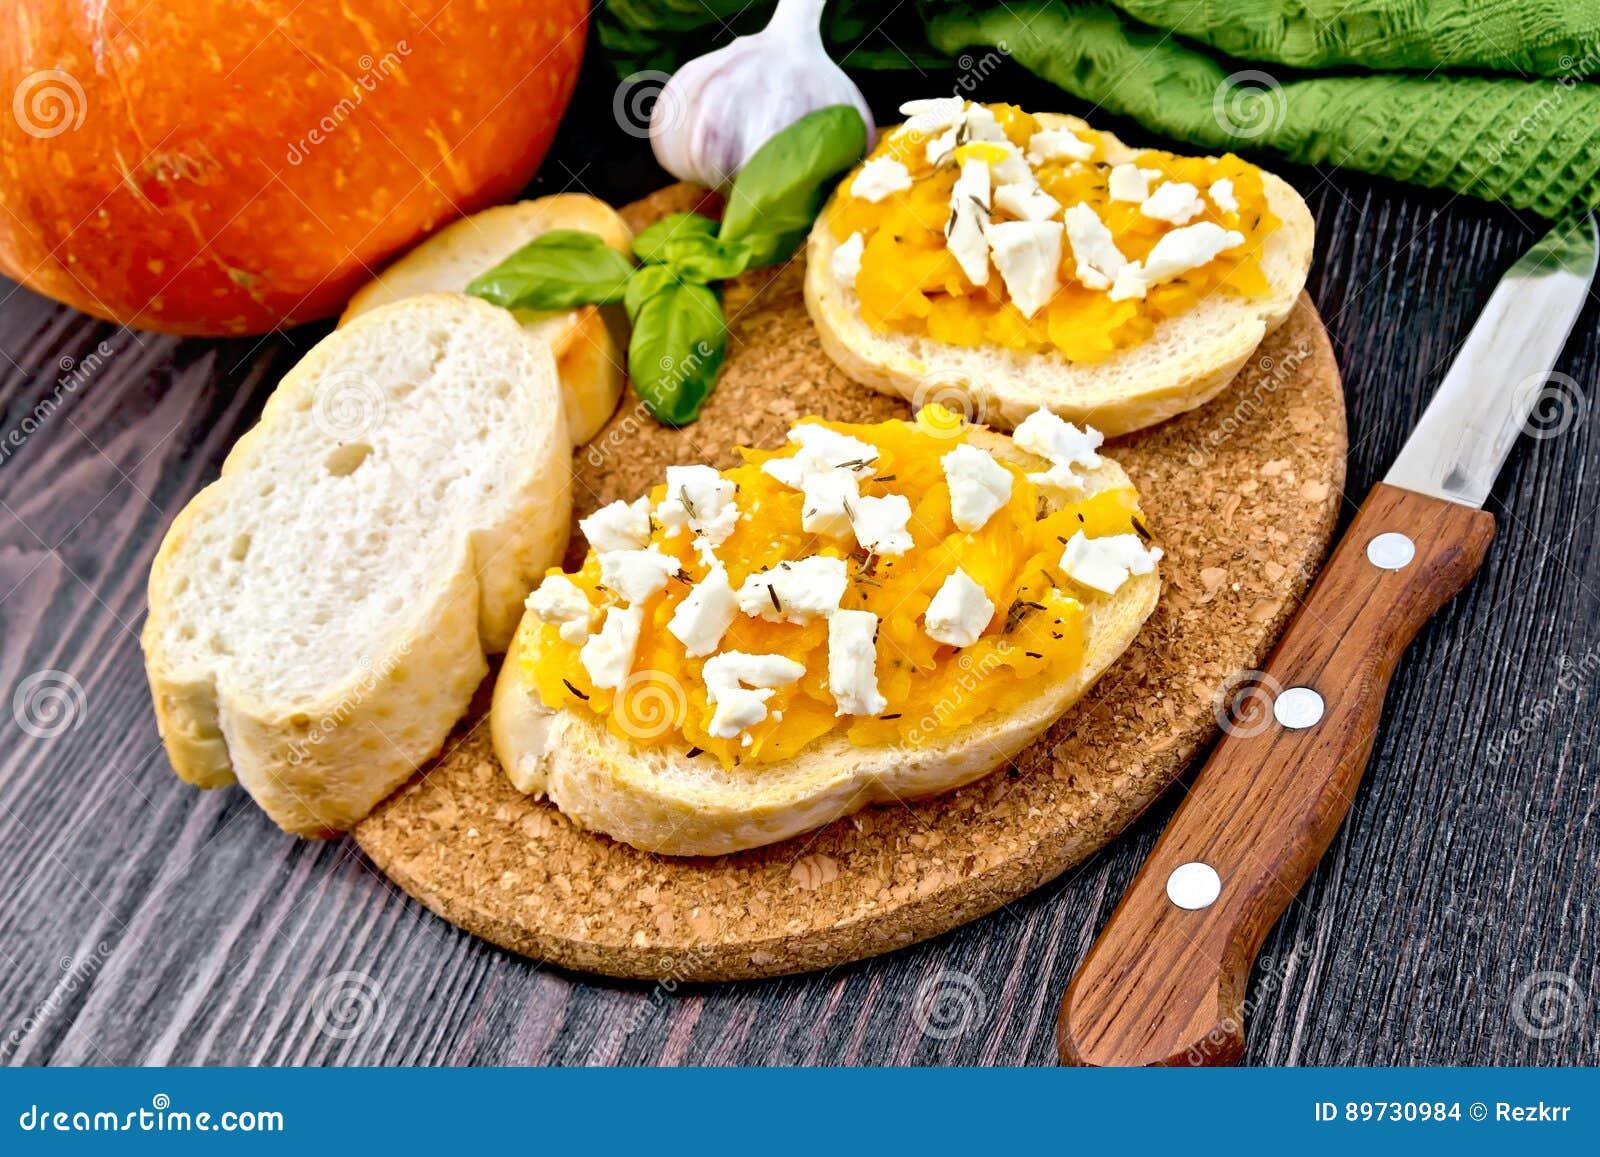 Bruschetta with pumpkin and feta on dark board